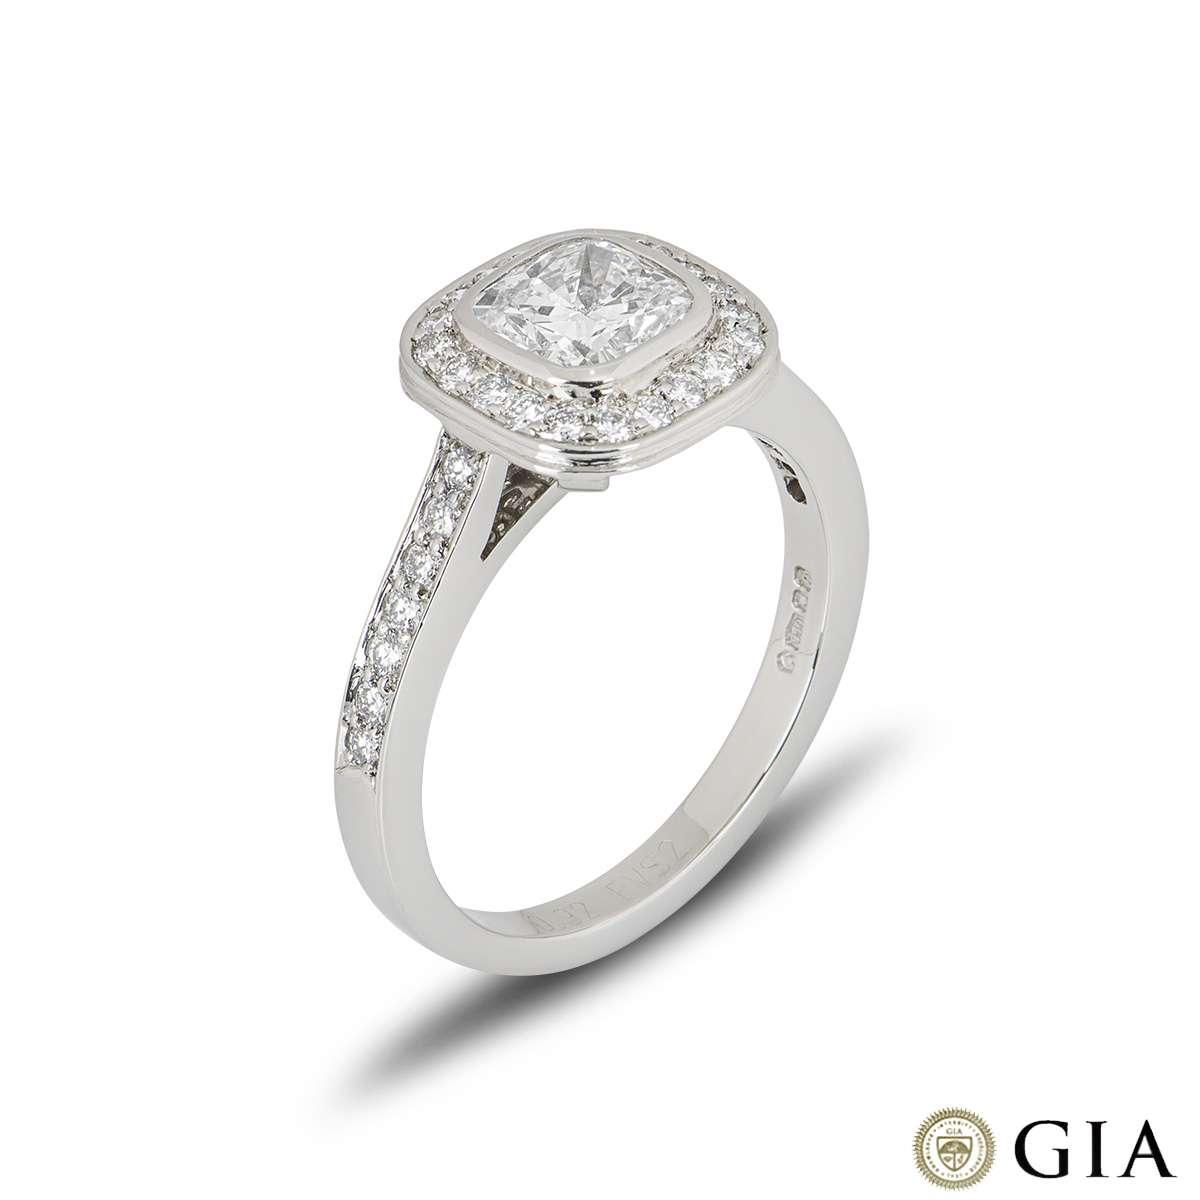 Platinum Cushion Cut Diamond Ring 0.92ct F/VS2